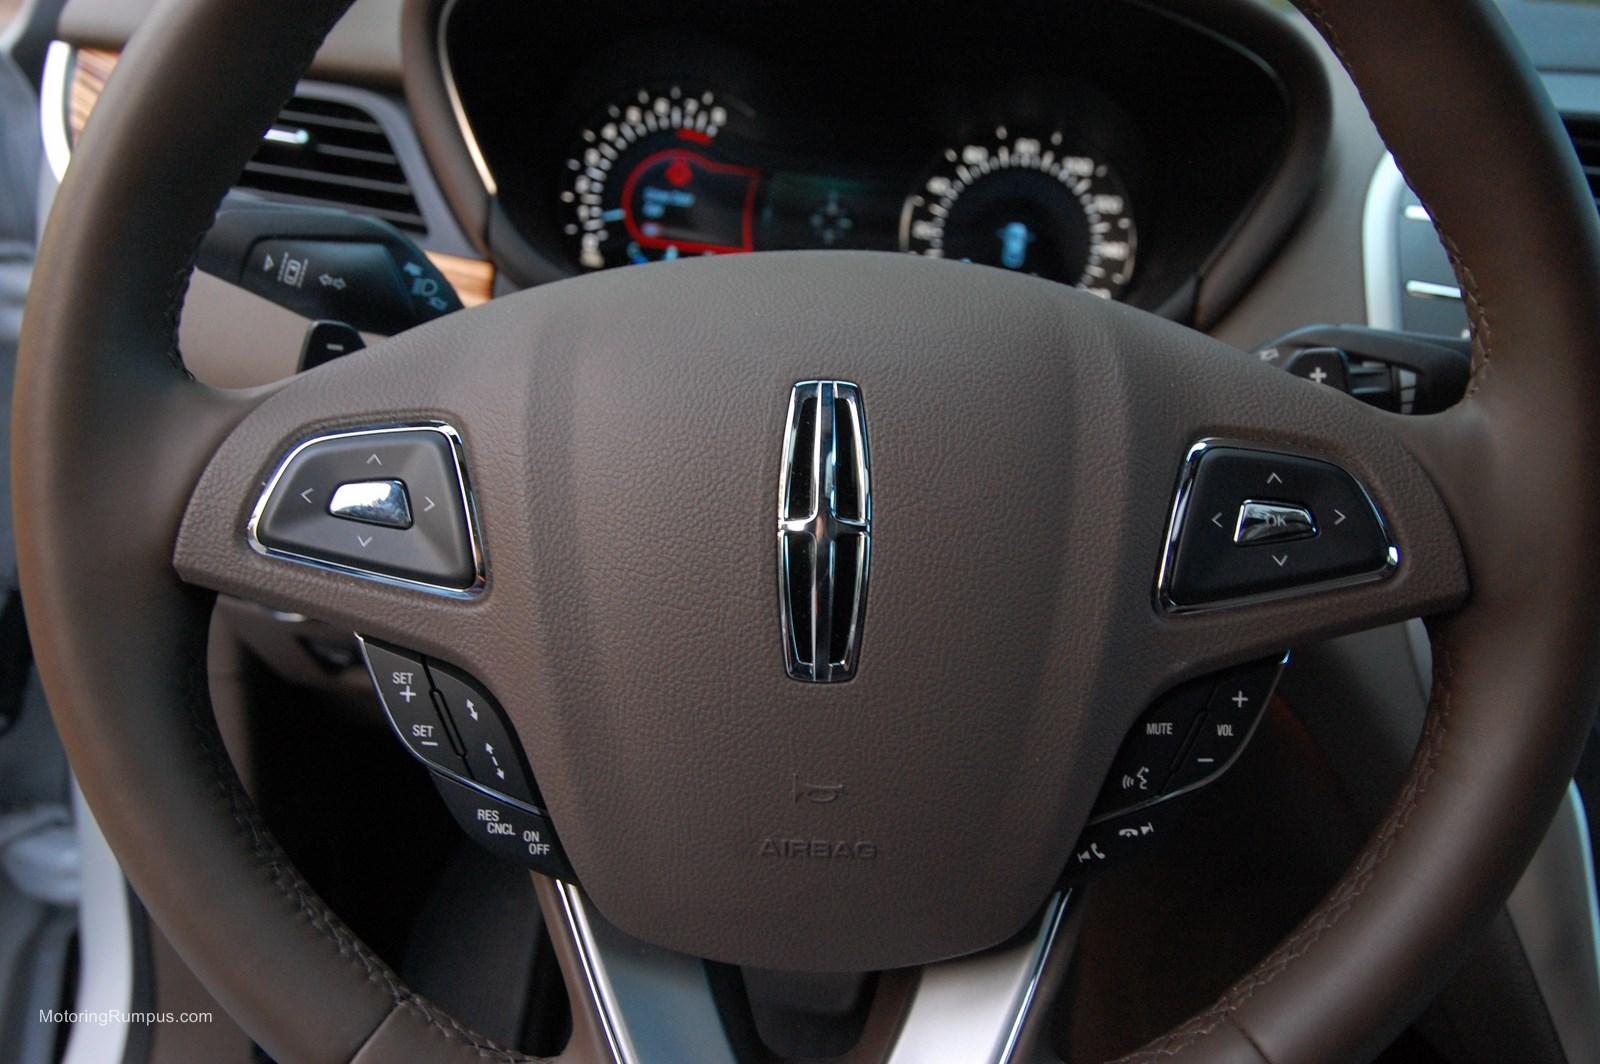 2015 Lincoln MKC Heated Steering Wheel